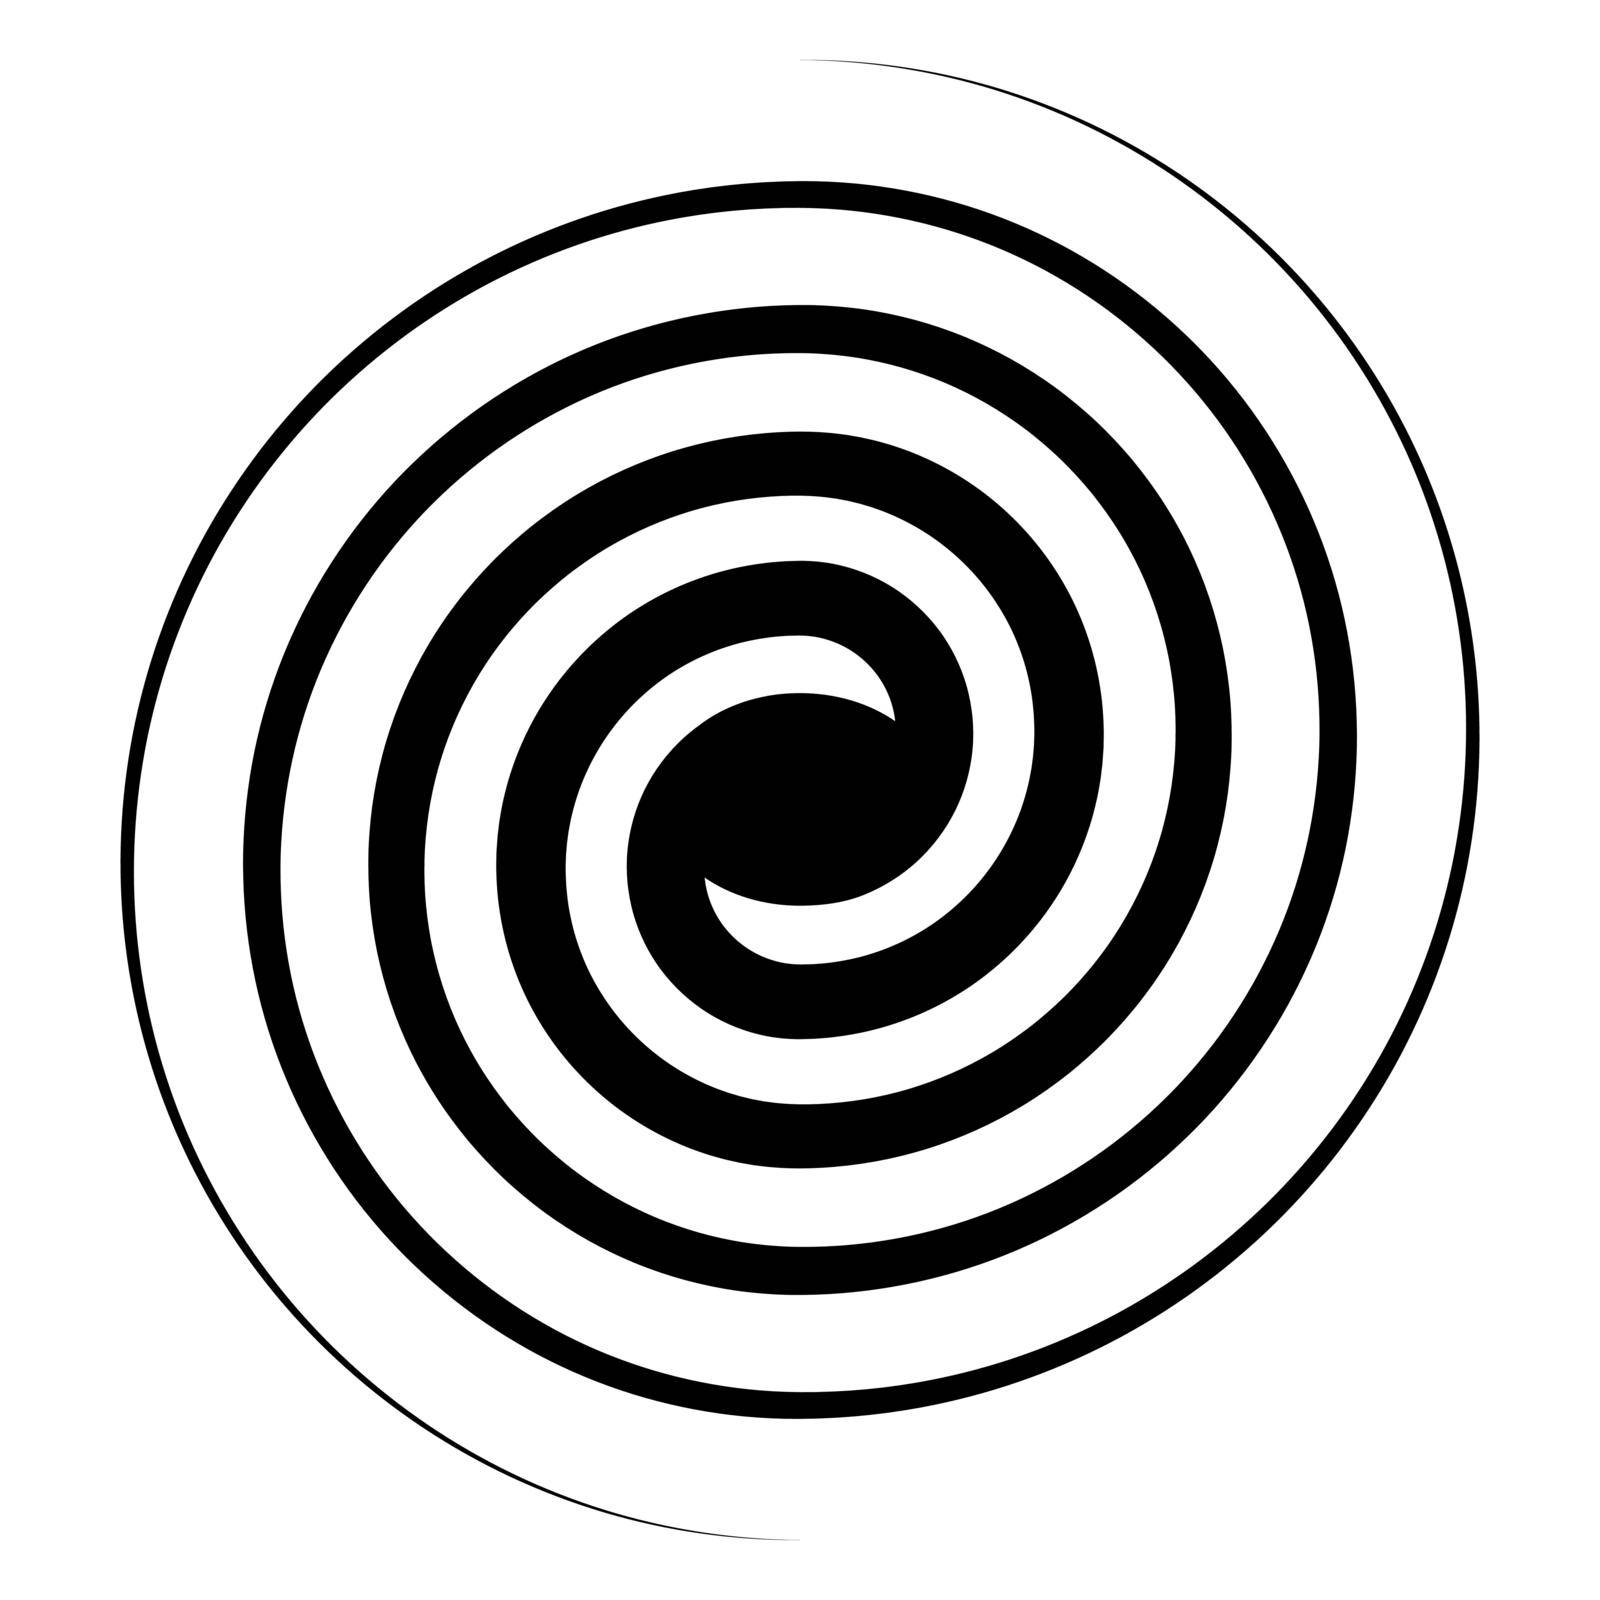 Spiral swirl icon, swirl sign vector double spiral galaxy evolution symbol by koksikoks